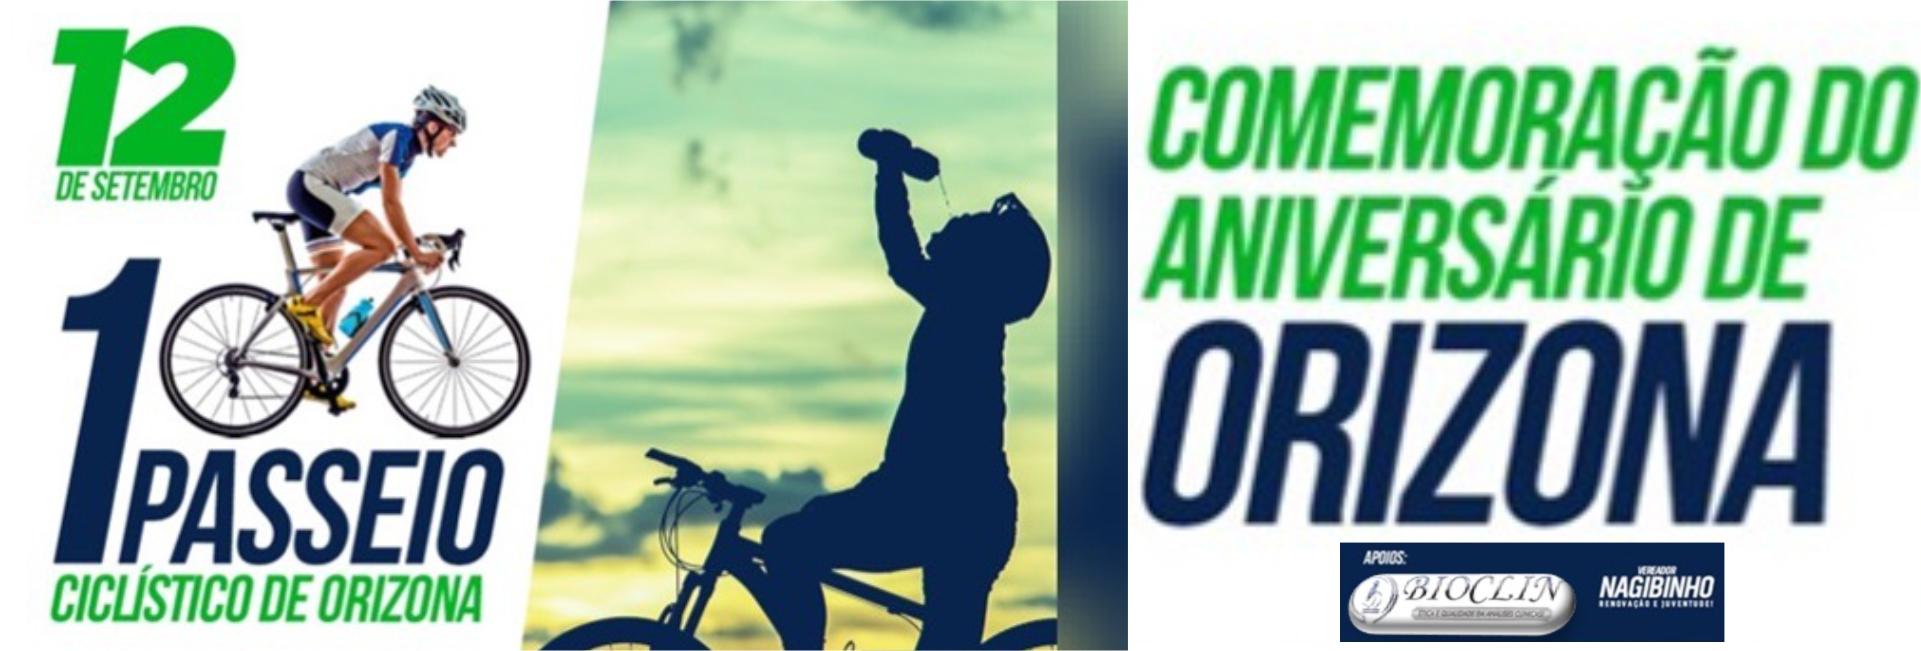 passeio-ciclistico-orizona-2021-SISTIME